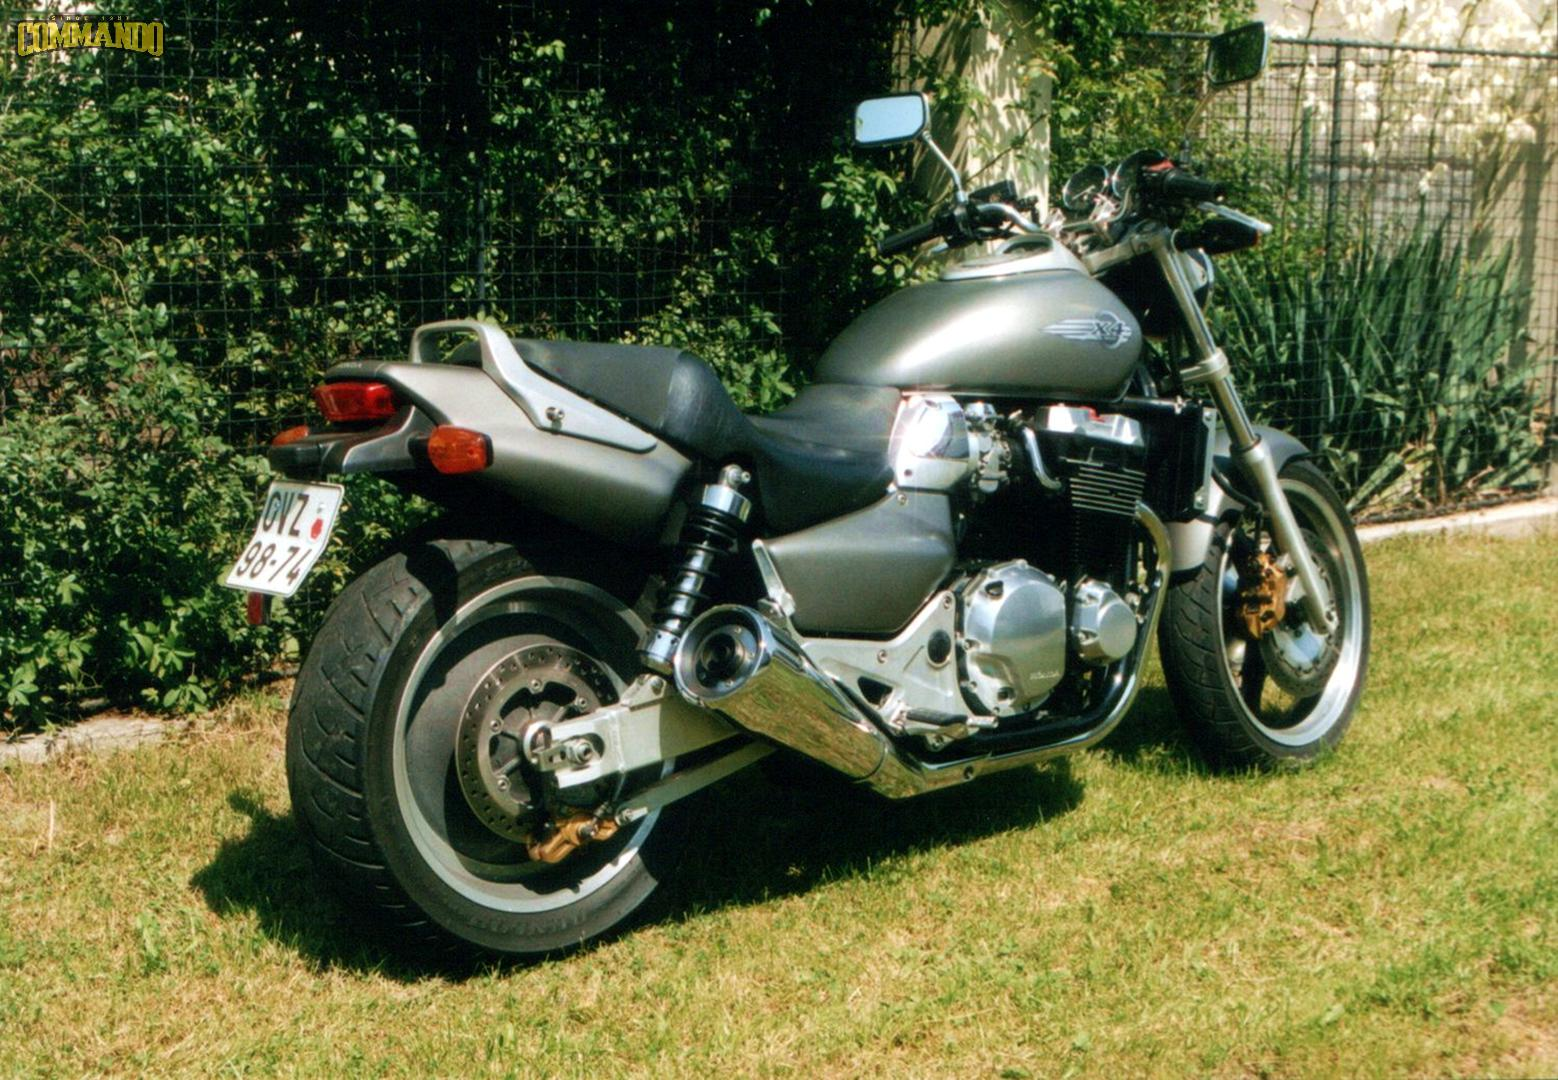 Honda x4 Spec Honda x4 2001 07 30 004 Jpg